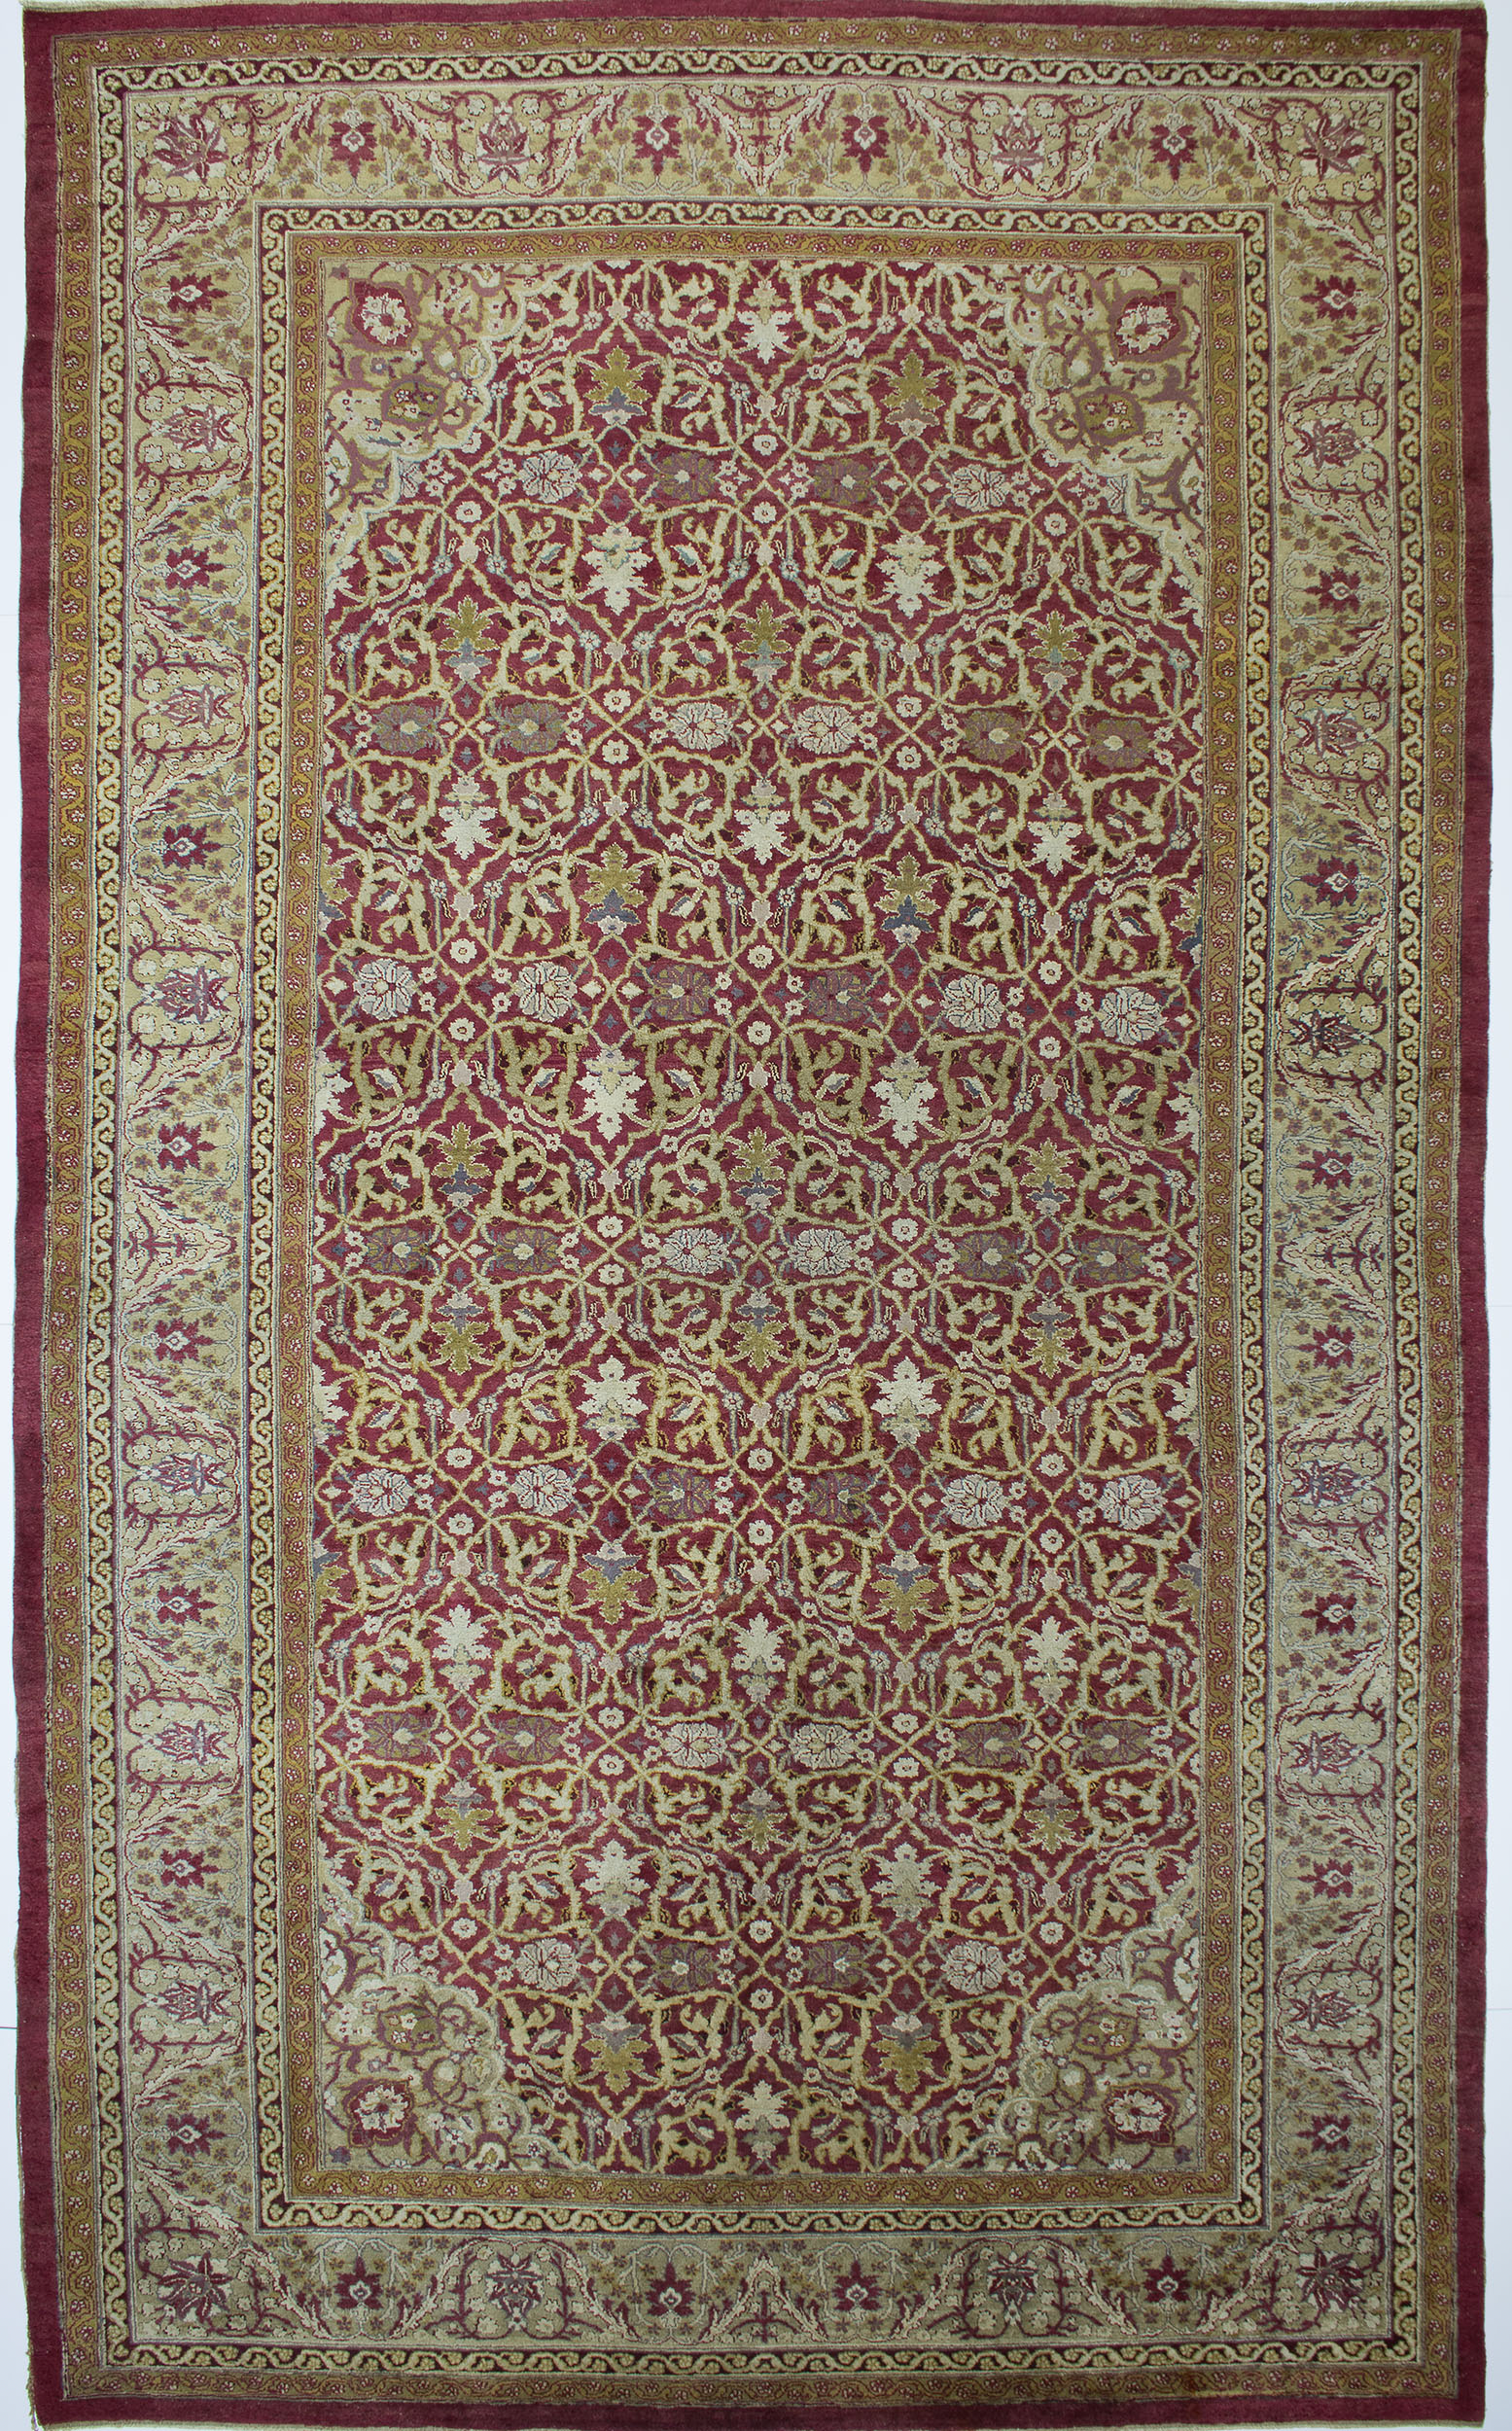 "Agra Carpet 17' 4"" x 10' 2"""